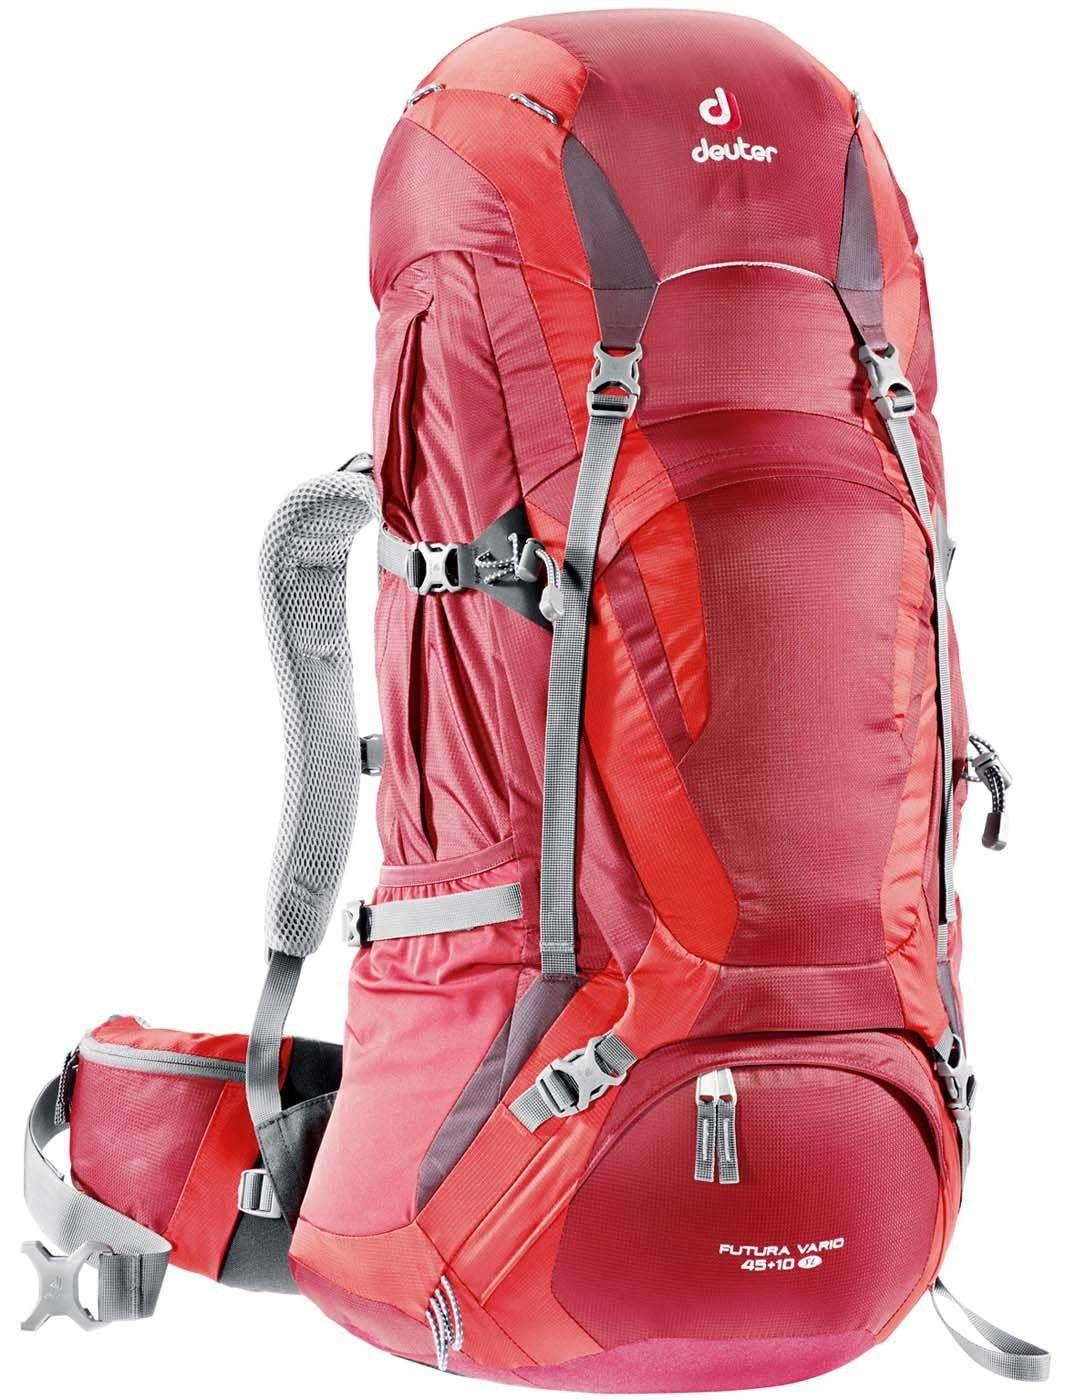 adf01f5c91 Deuter Futura Vario 45 + 10 SL Women's | backpacks | Hiking backpack ...